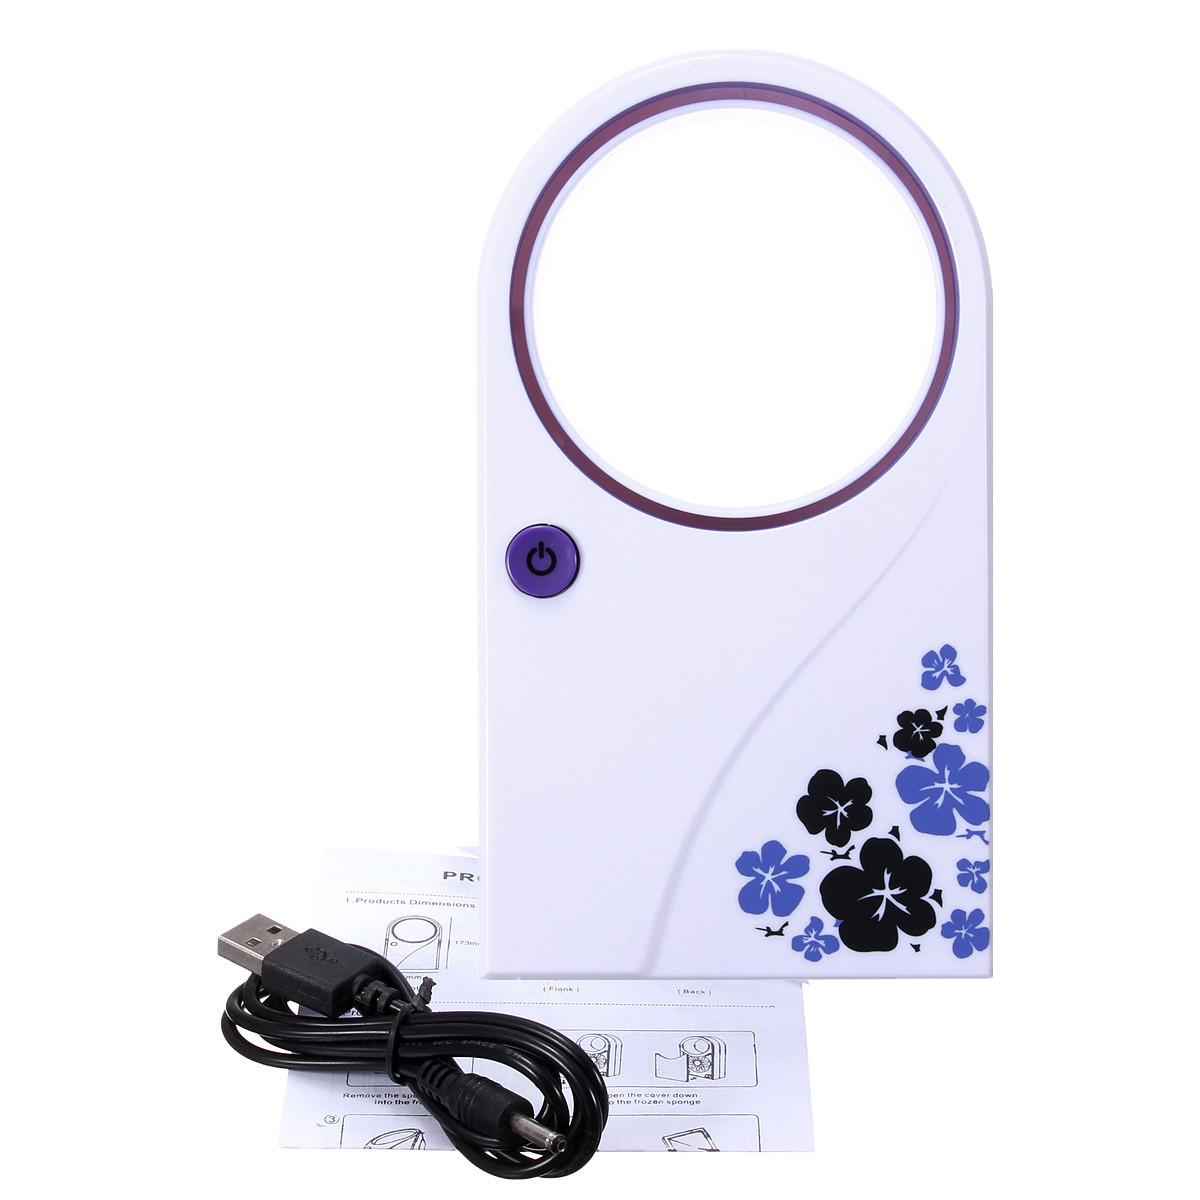 Held USB Bladeless Refrigeration Desktop Air Conditioner Cooler PC Fan #2D2D9E